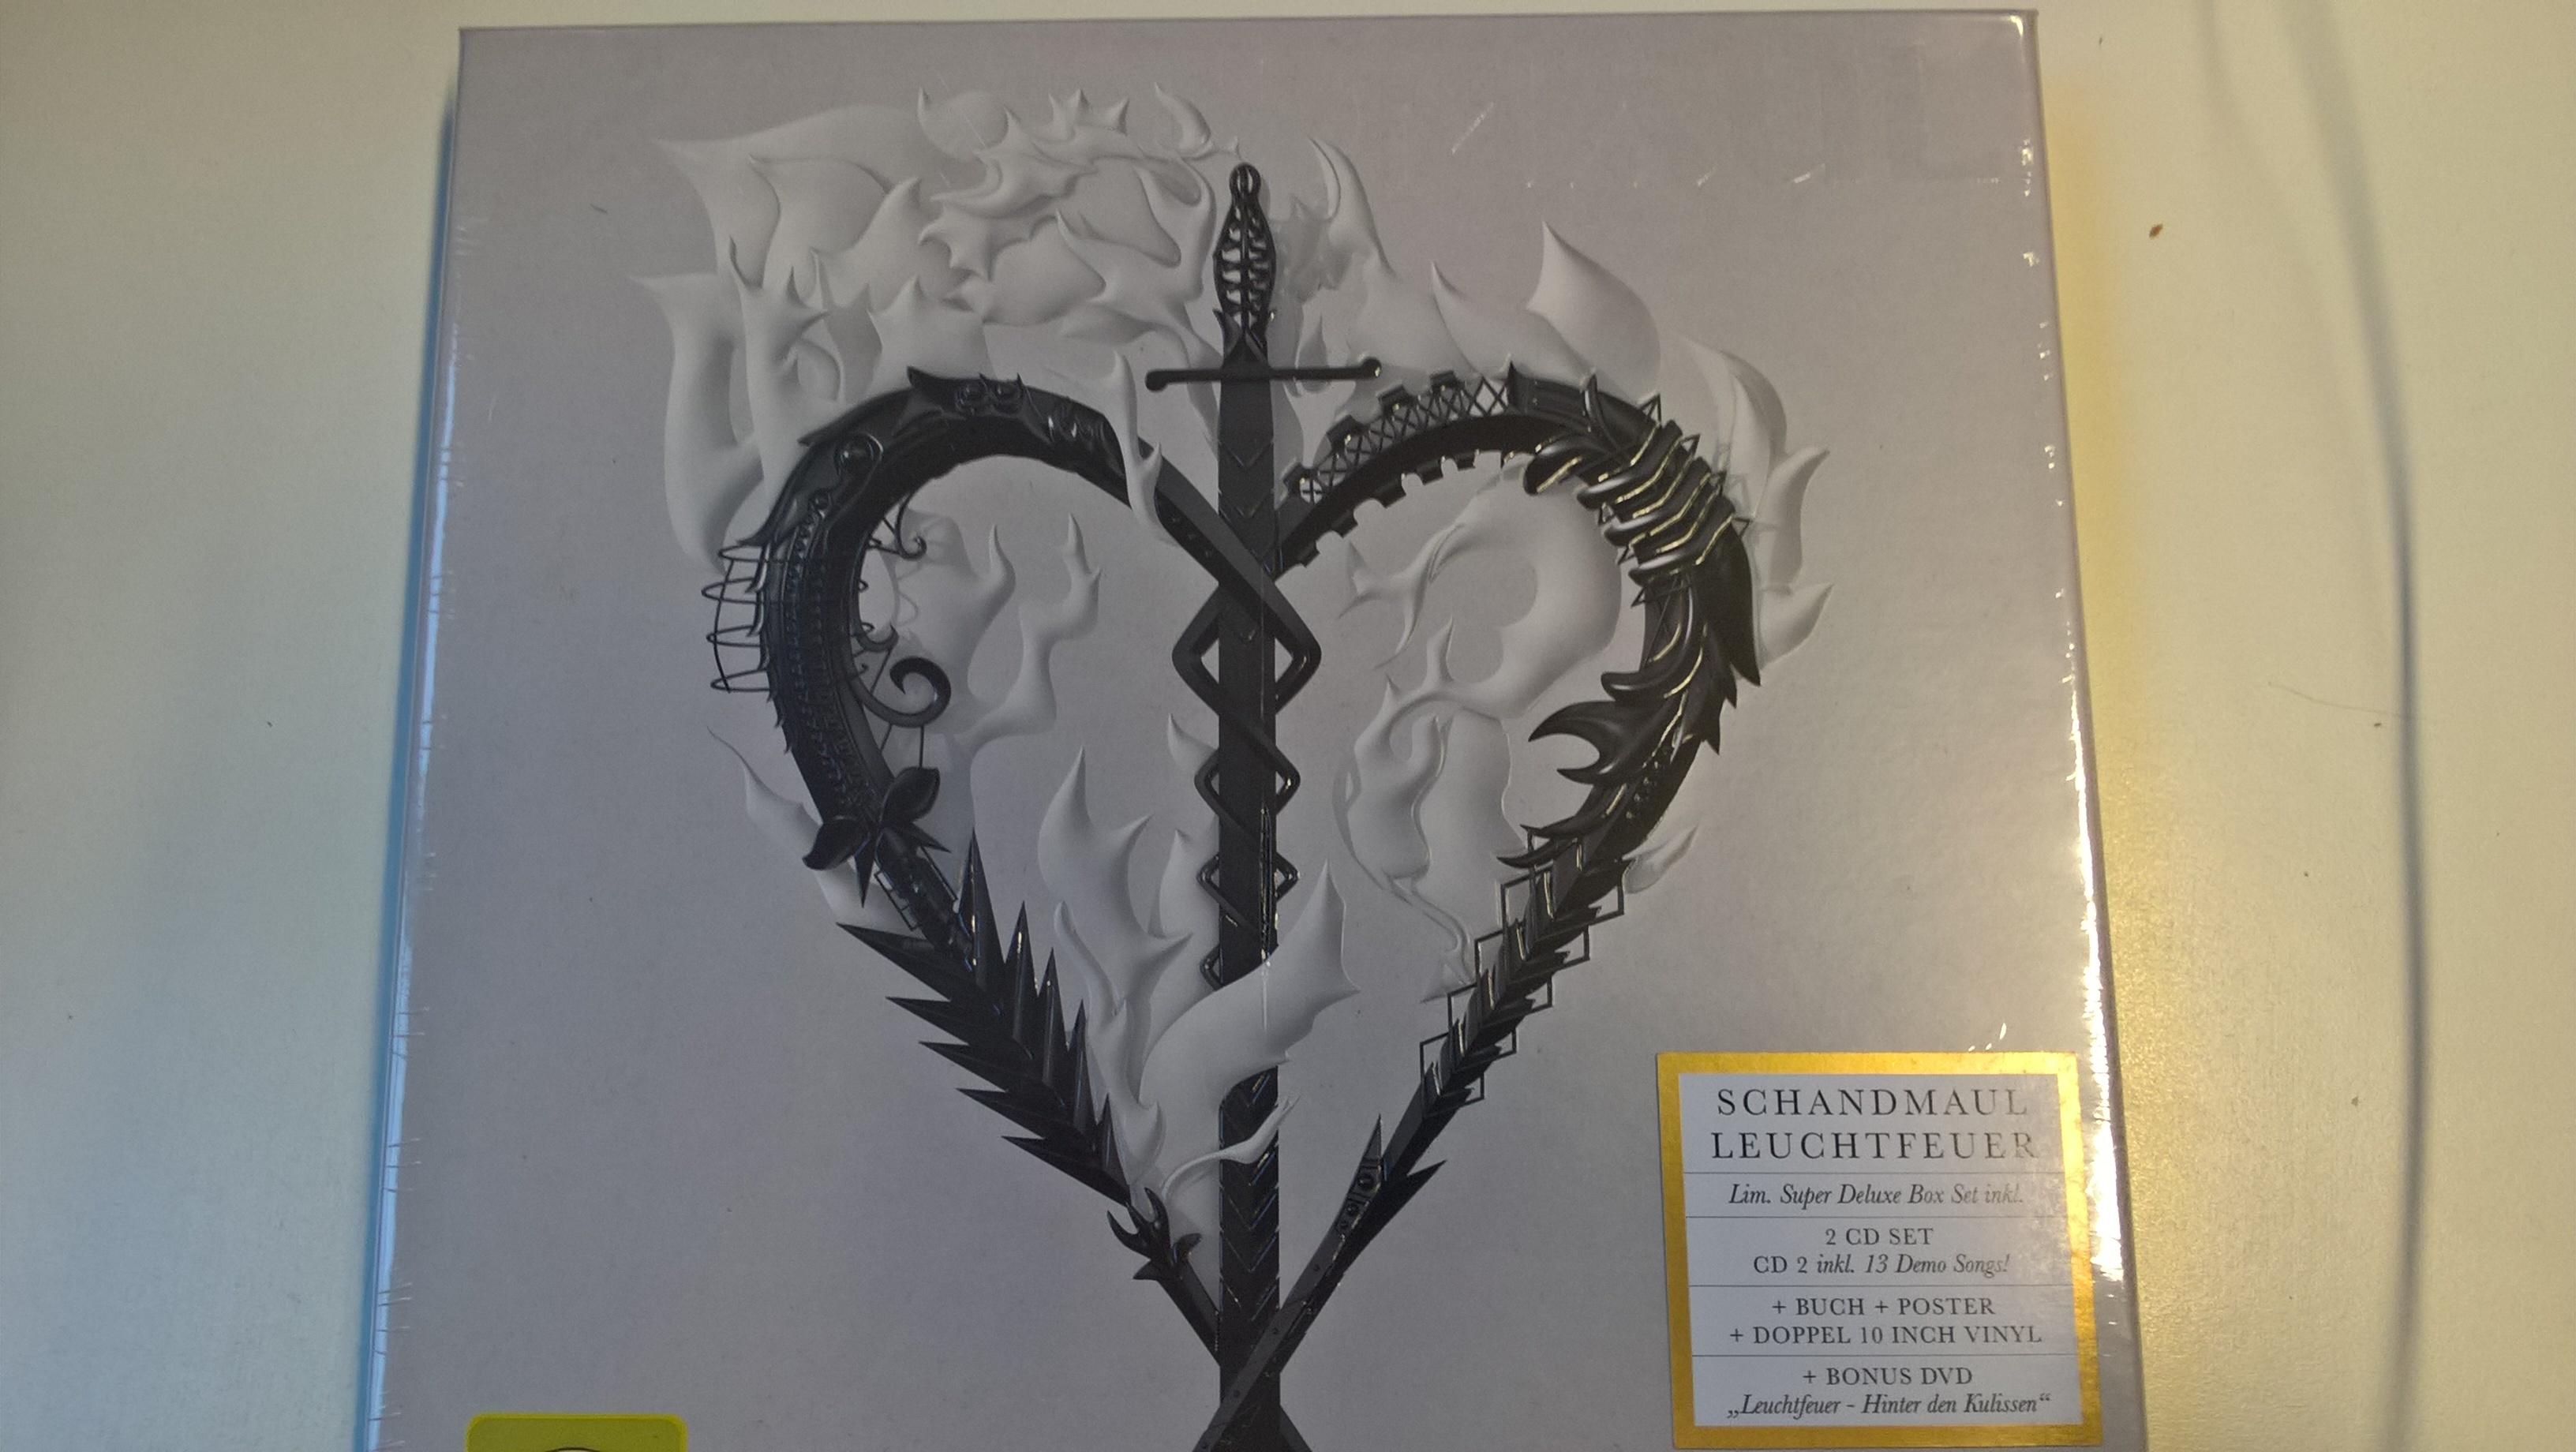 Schandmaul LEUCHTFEUER Deluxe-Box